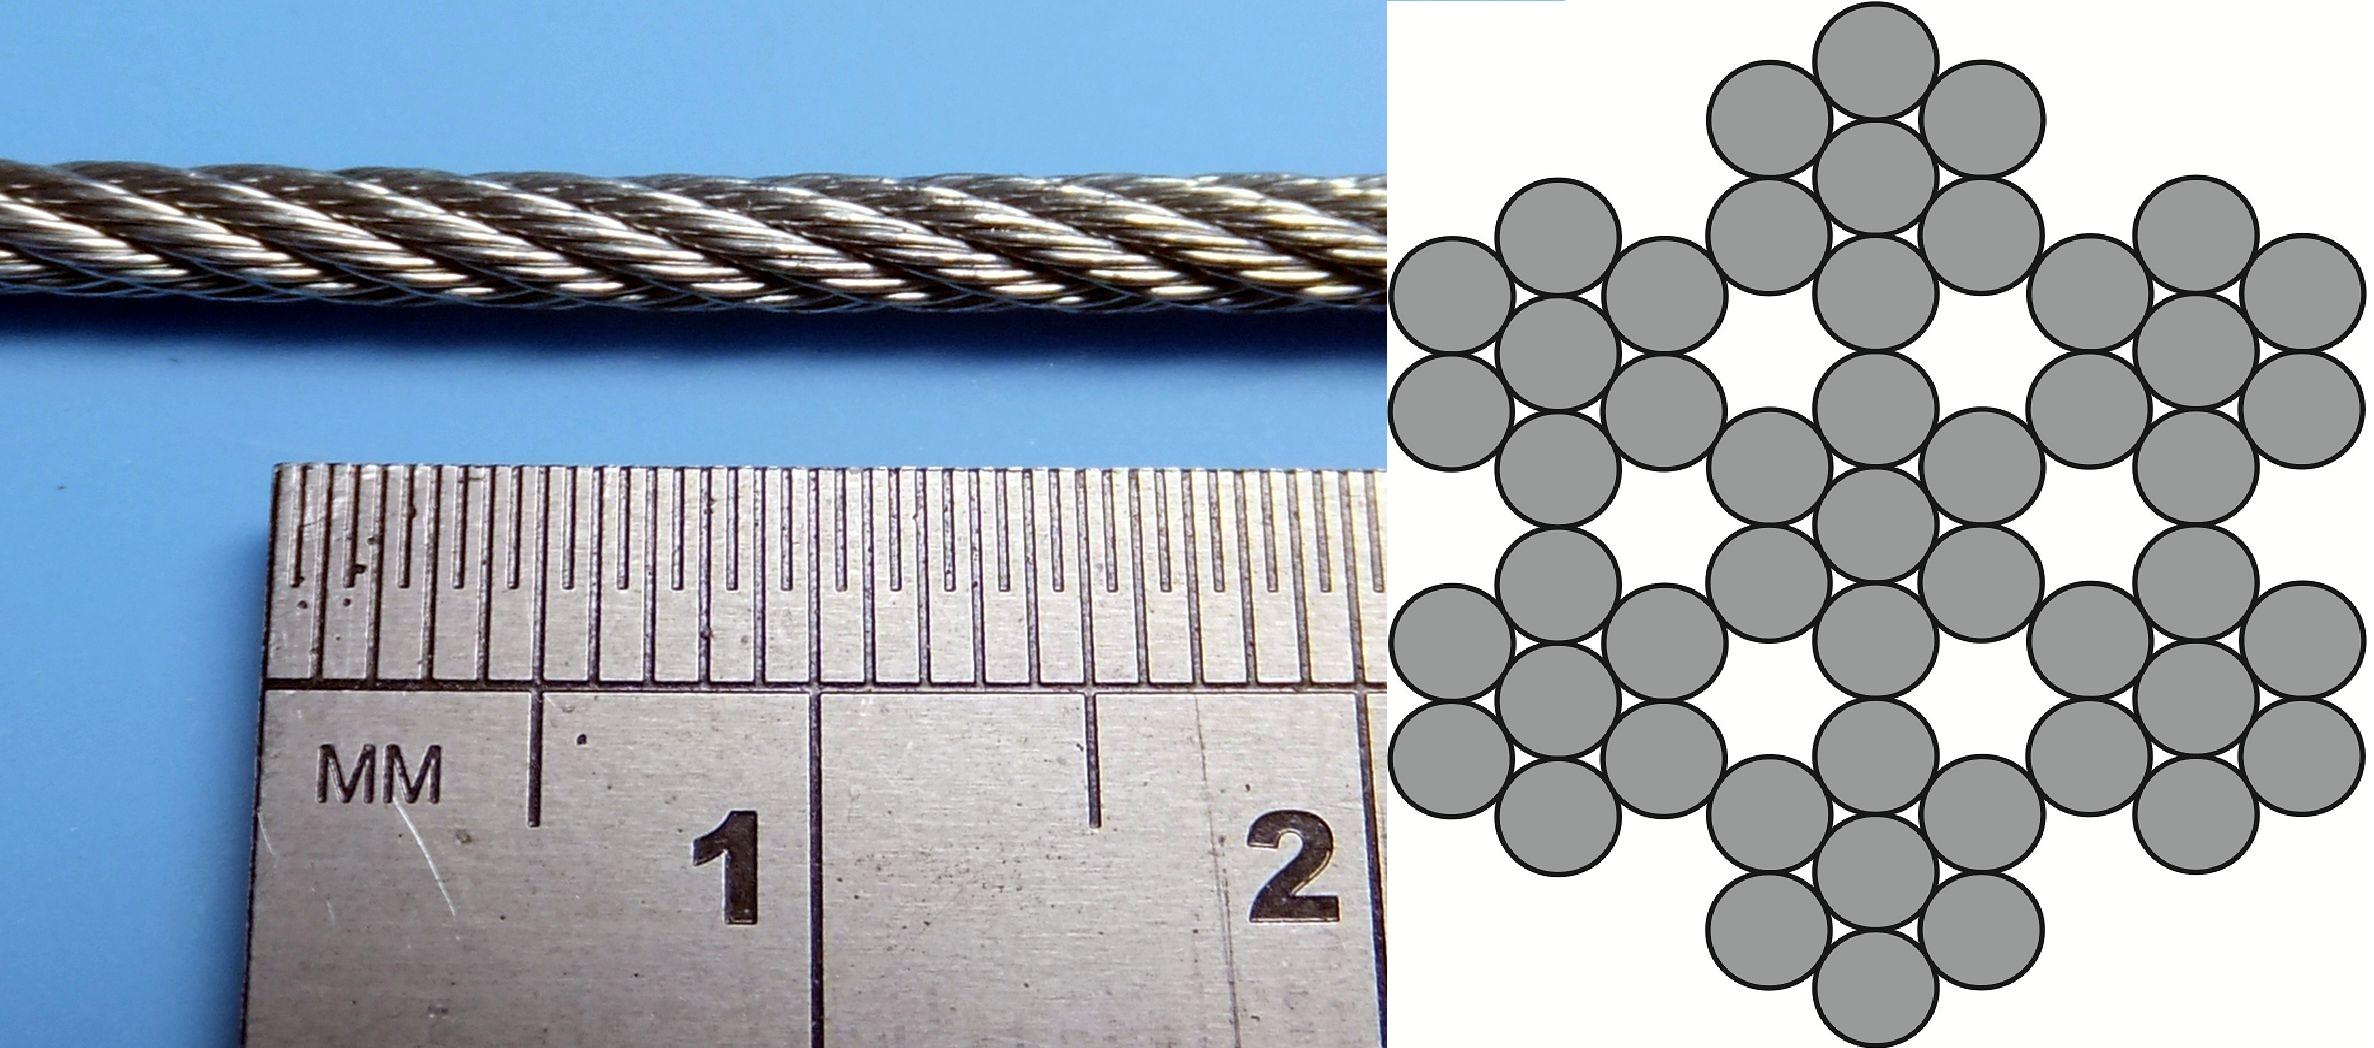 2 5mm Galvanised Steel Cable 1m Prime Miniatures